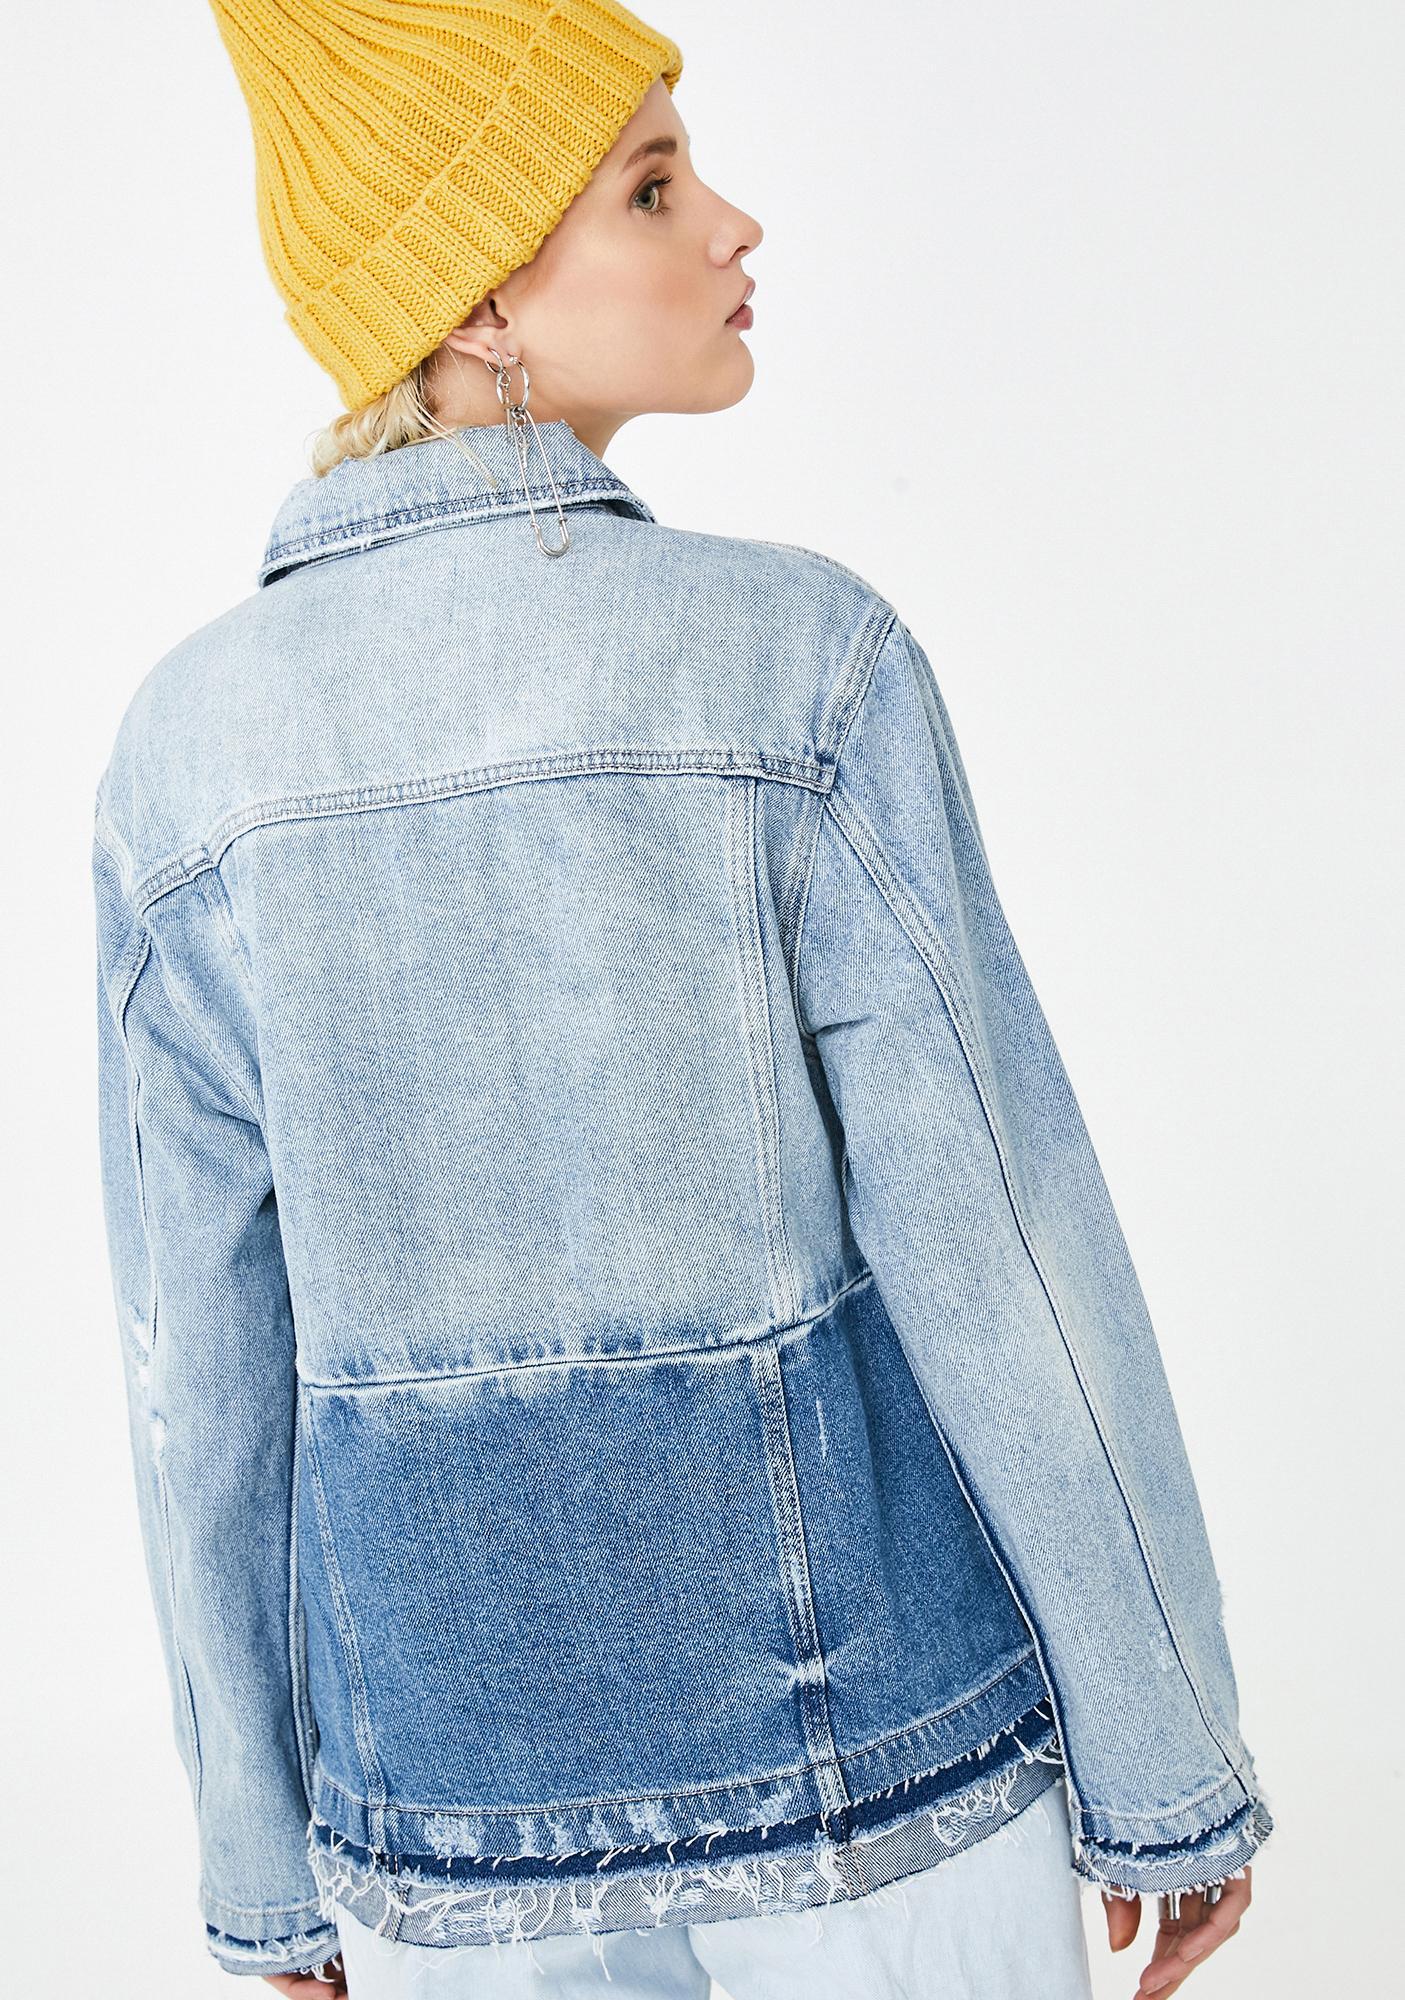 Hidden Denim Light Wash Two Toned Frayed Jacket